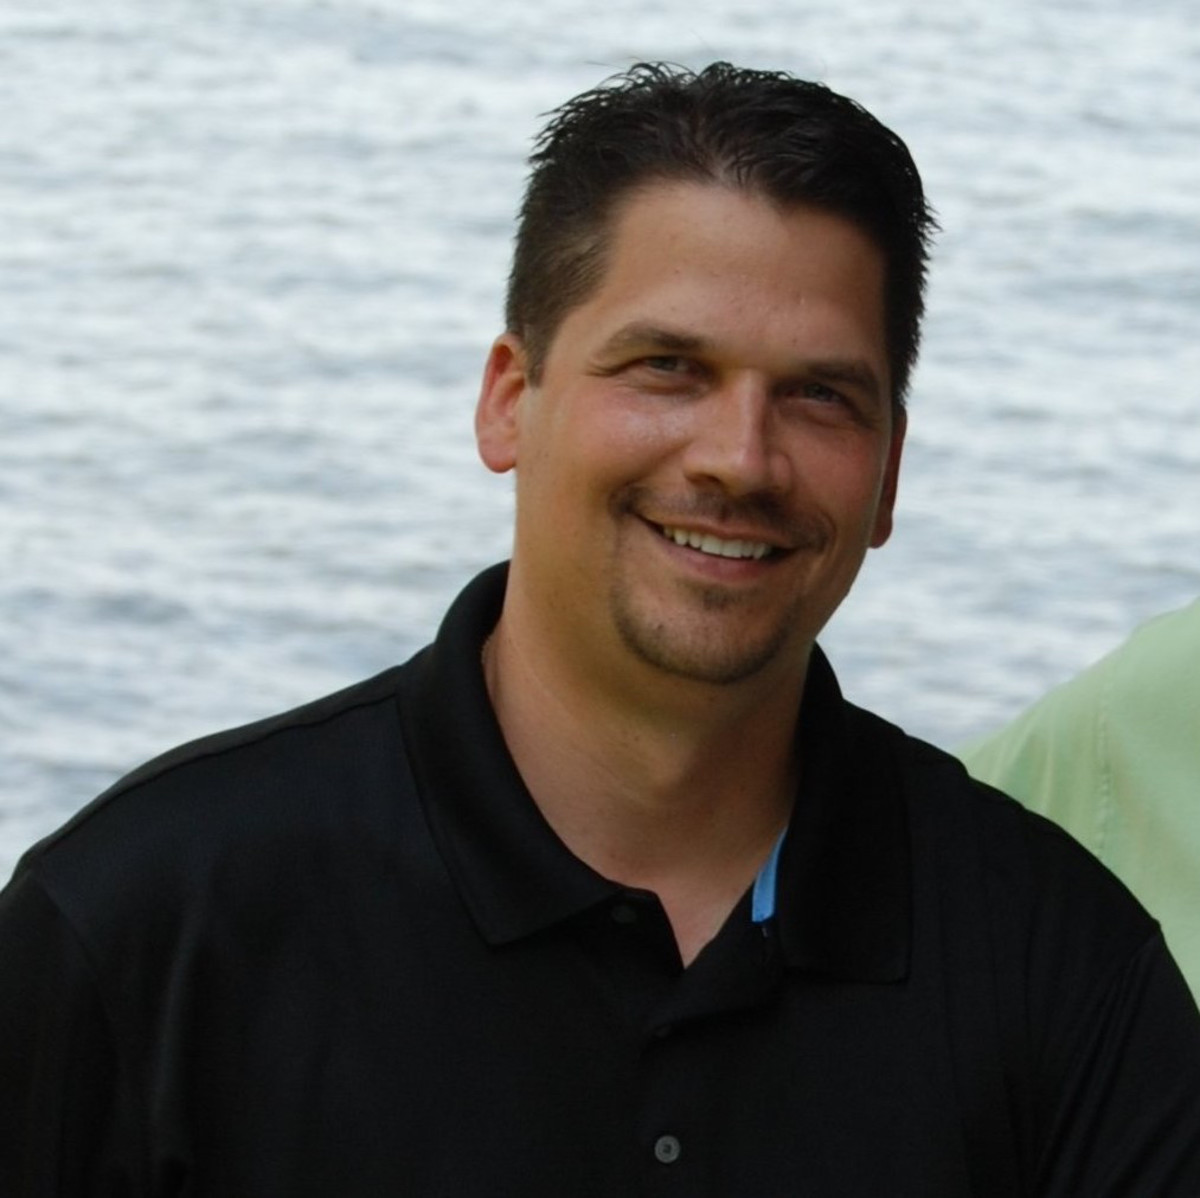 Dave Karpinski